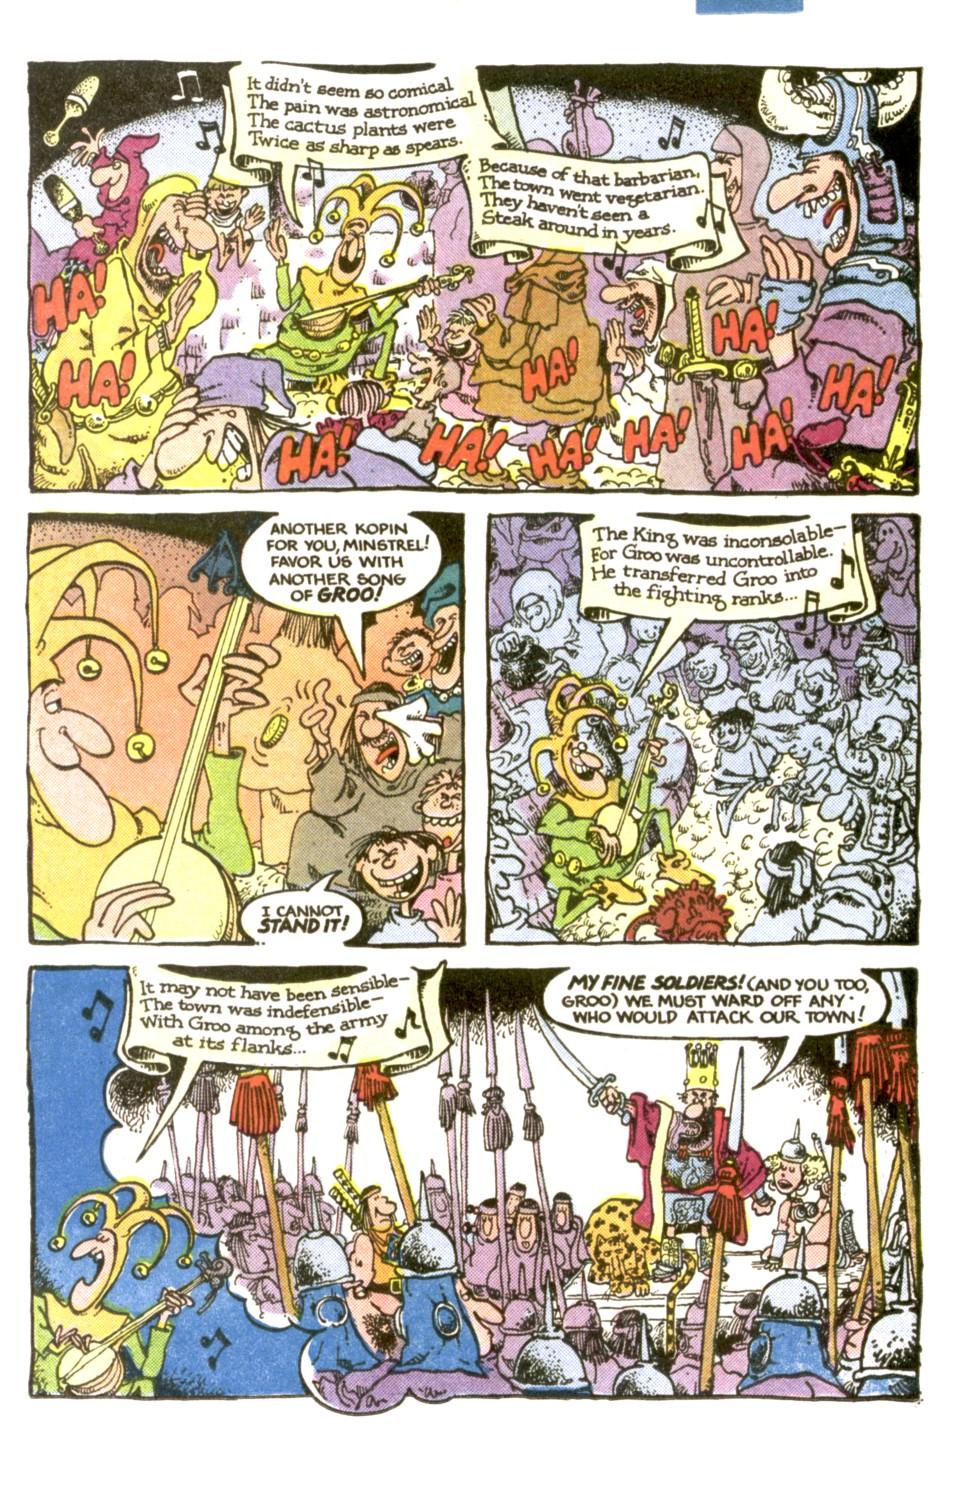 Read online Sergio Aragonés Groo the Wanderer comic -  Issue #1 - 9